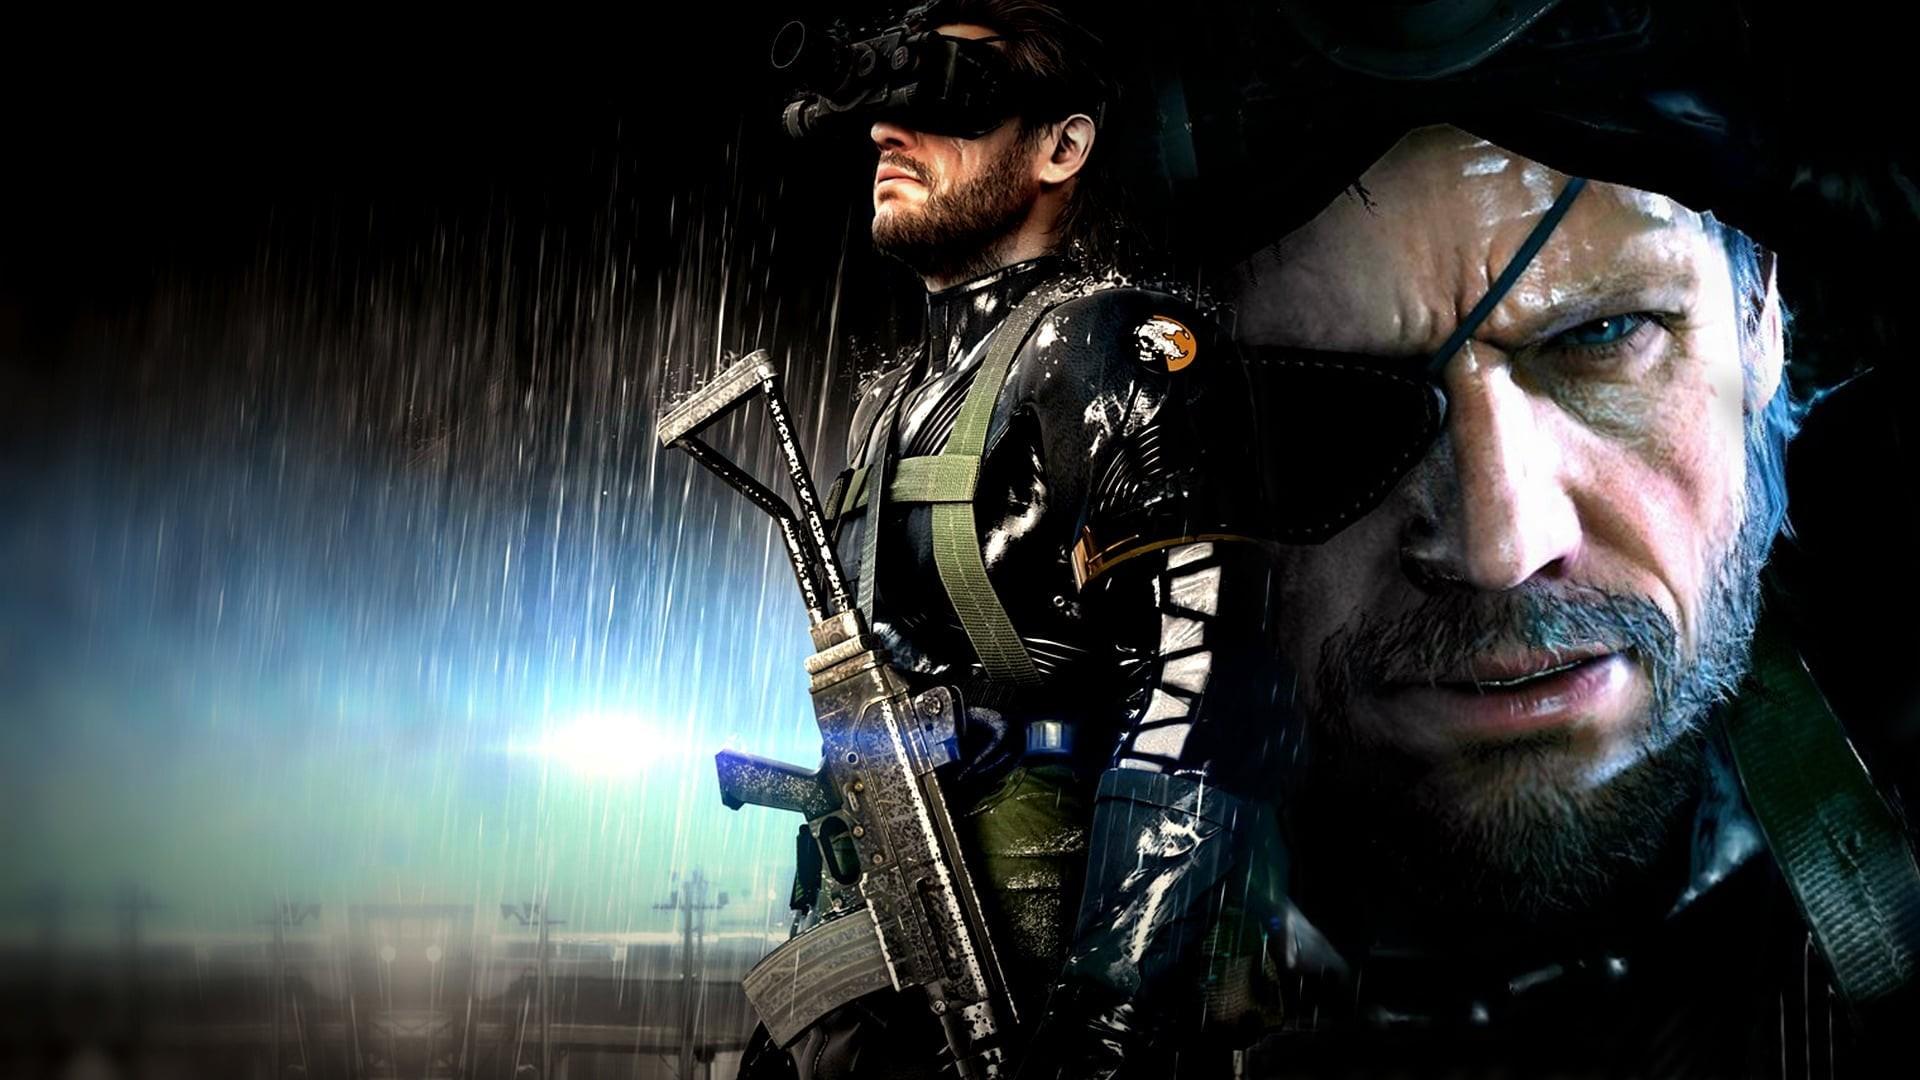 Metal Gear Solid 5 The Phantom Pain for desktop